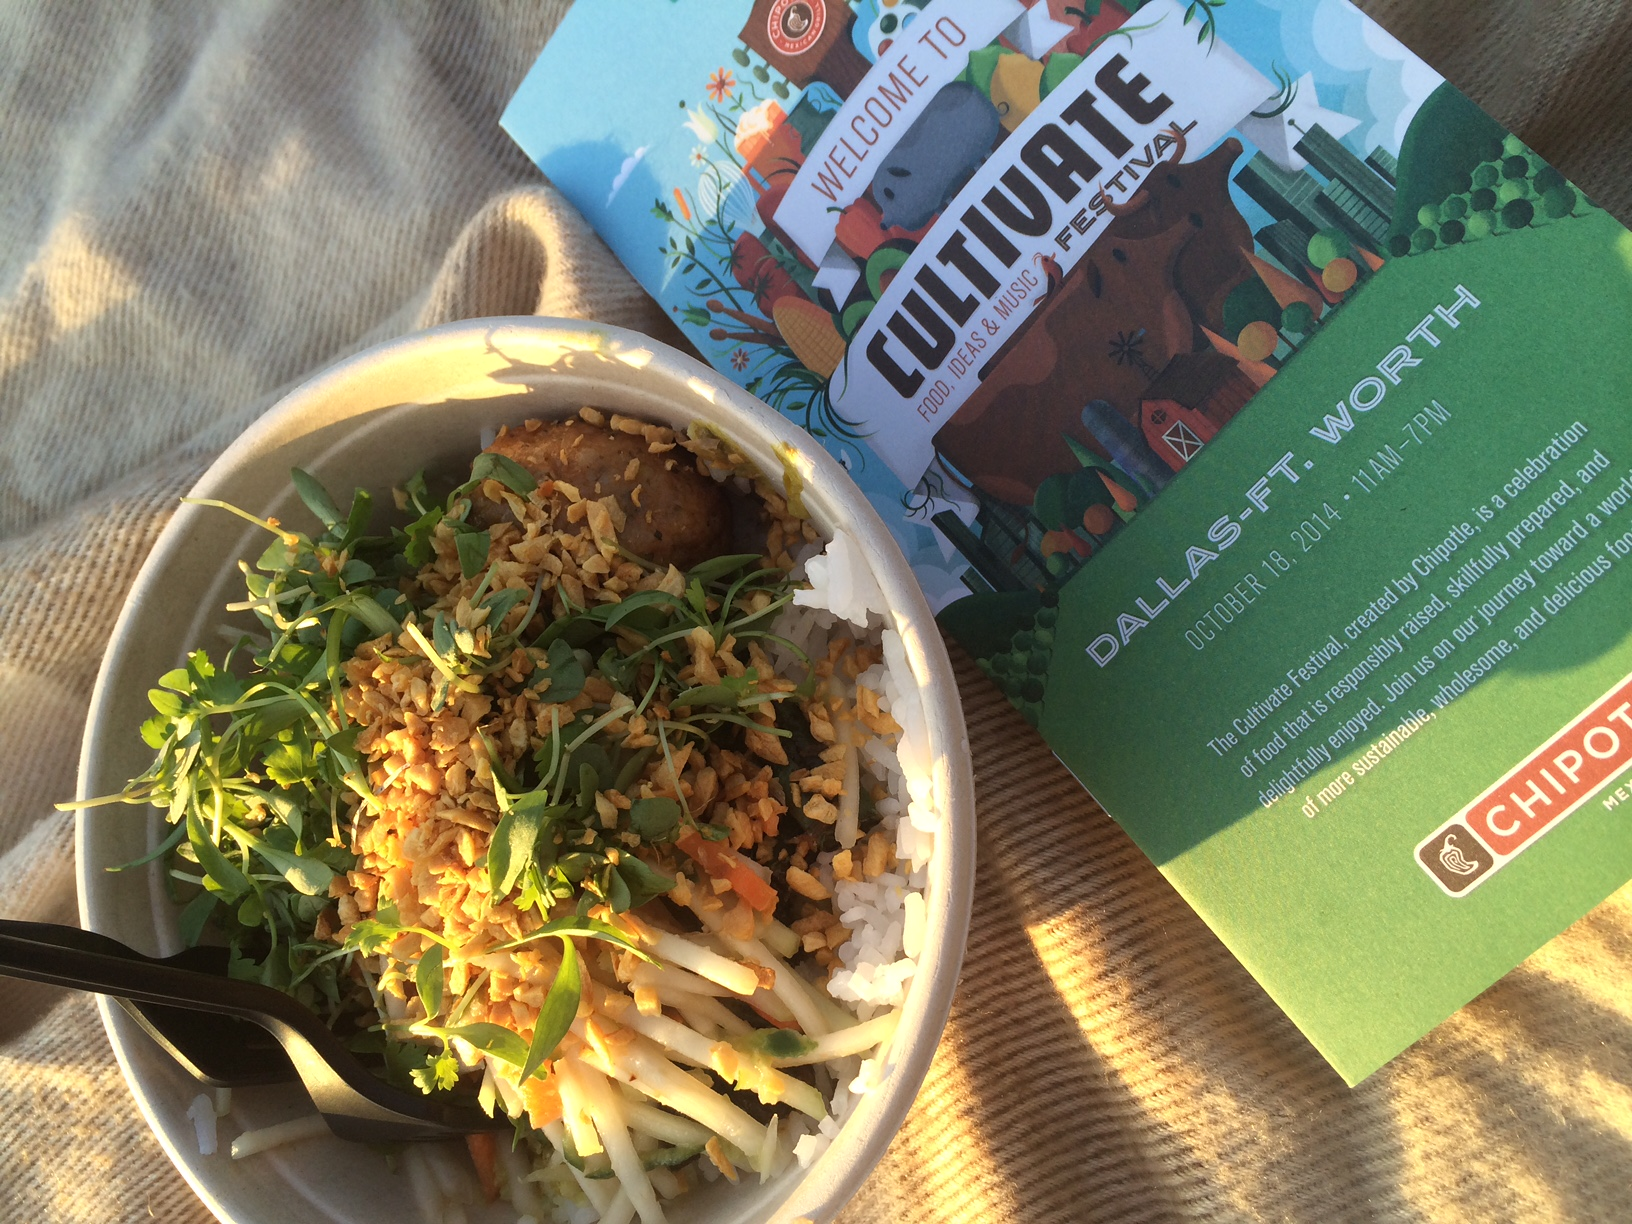 Chipotle chicken salad bowl via dallasfoodnerd.com